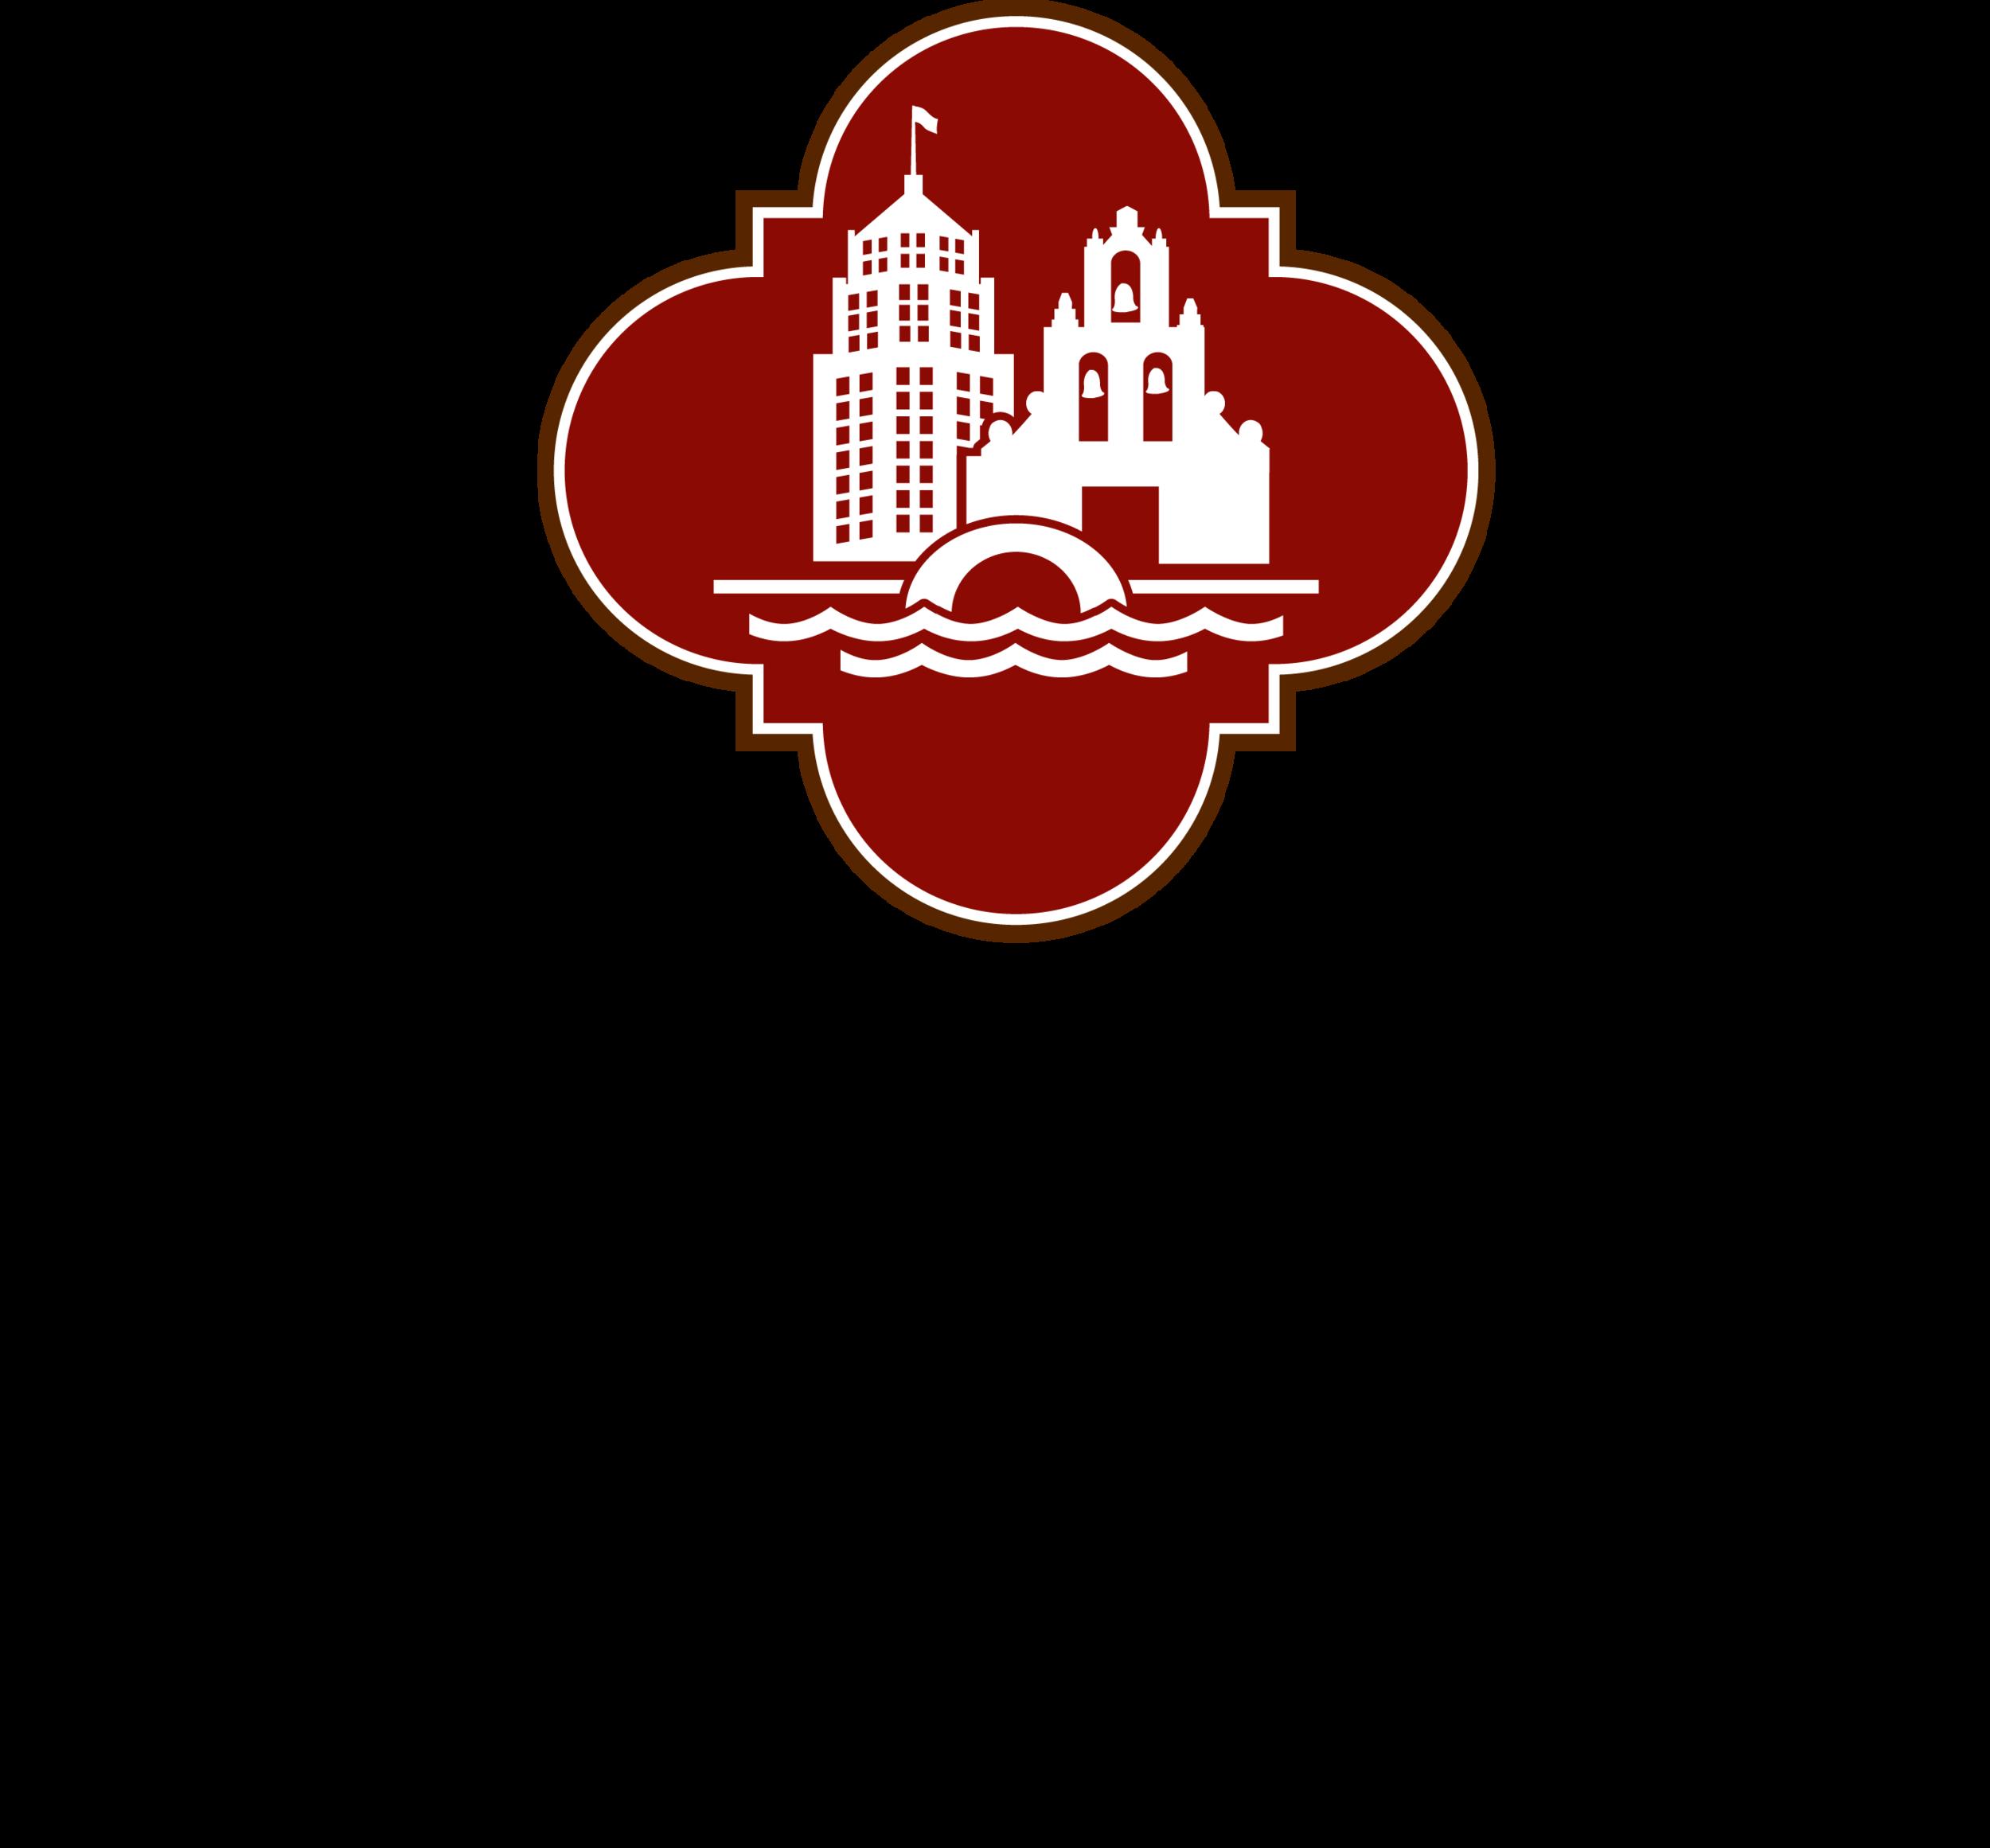 OHP_Vert_Logos_Master_01.png